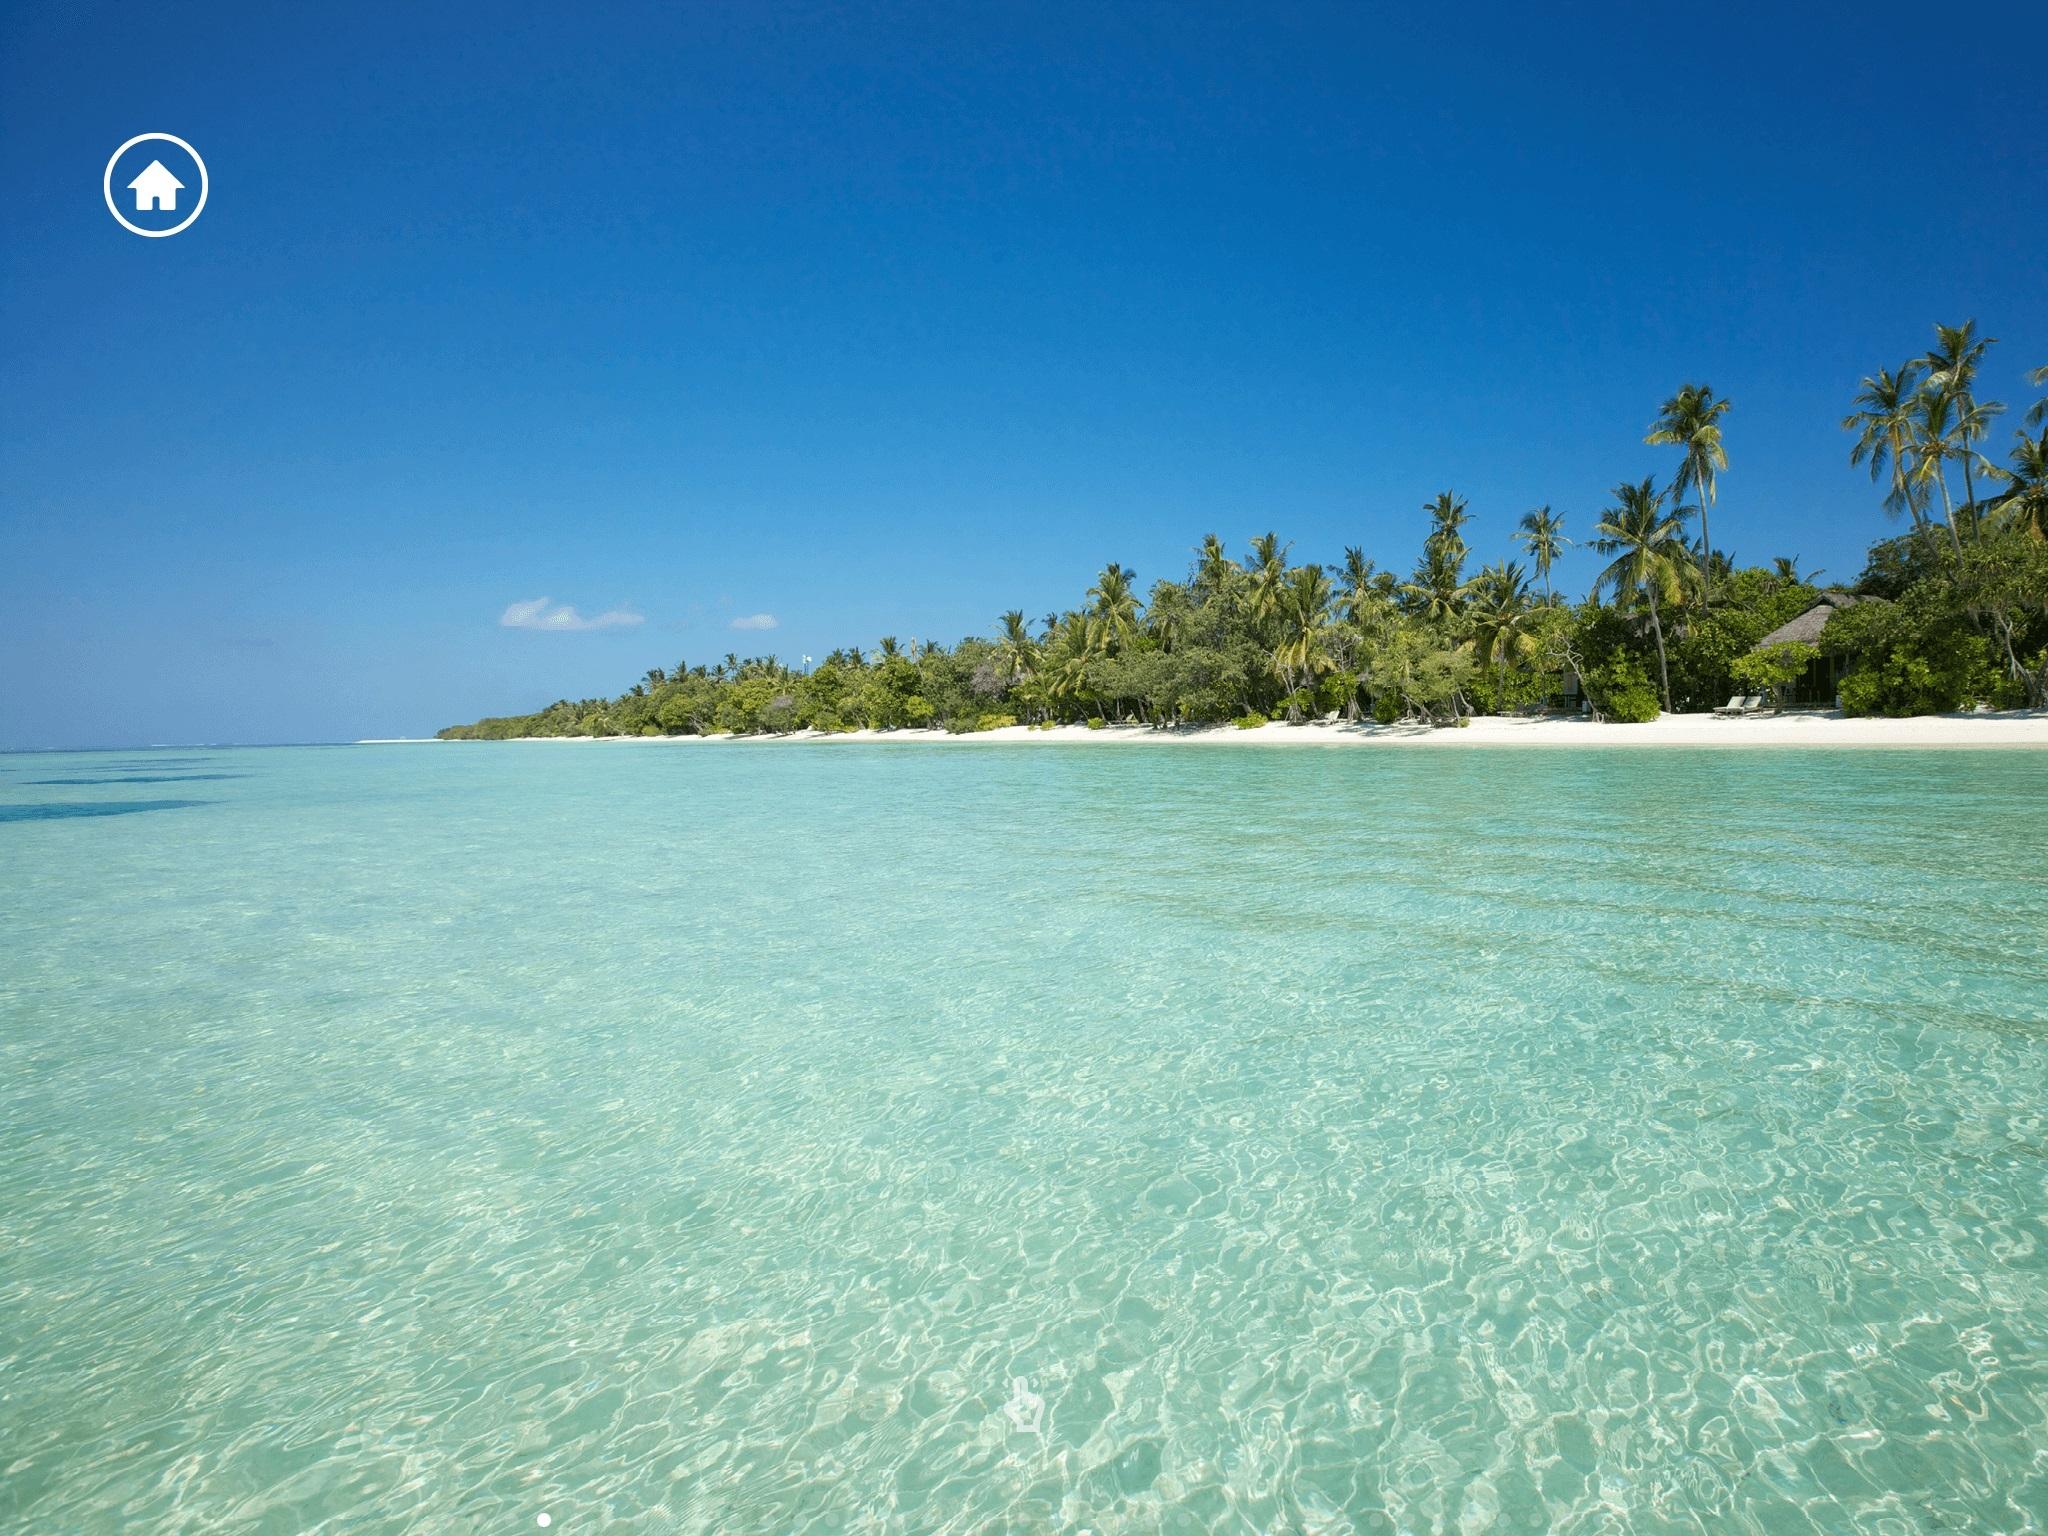 Ari Atoll, Maldives  № 1466102 загрузить